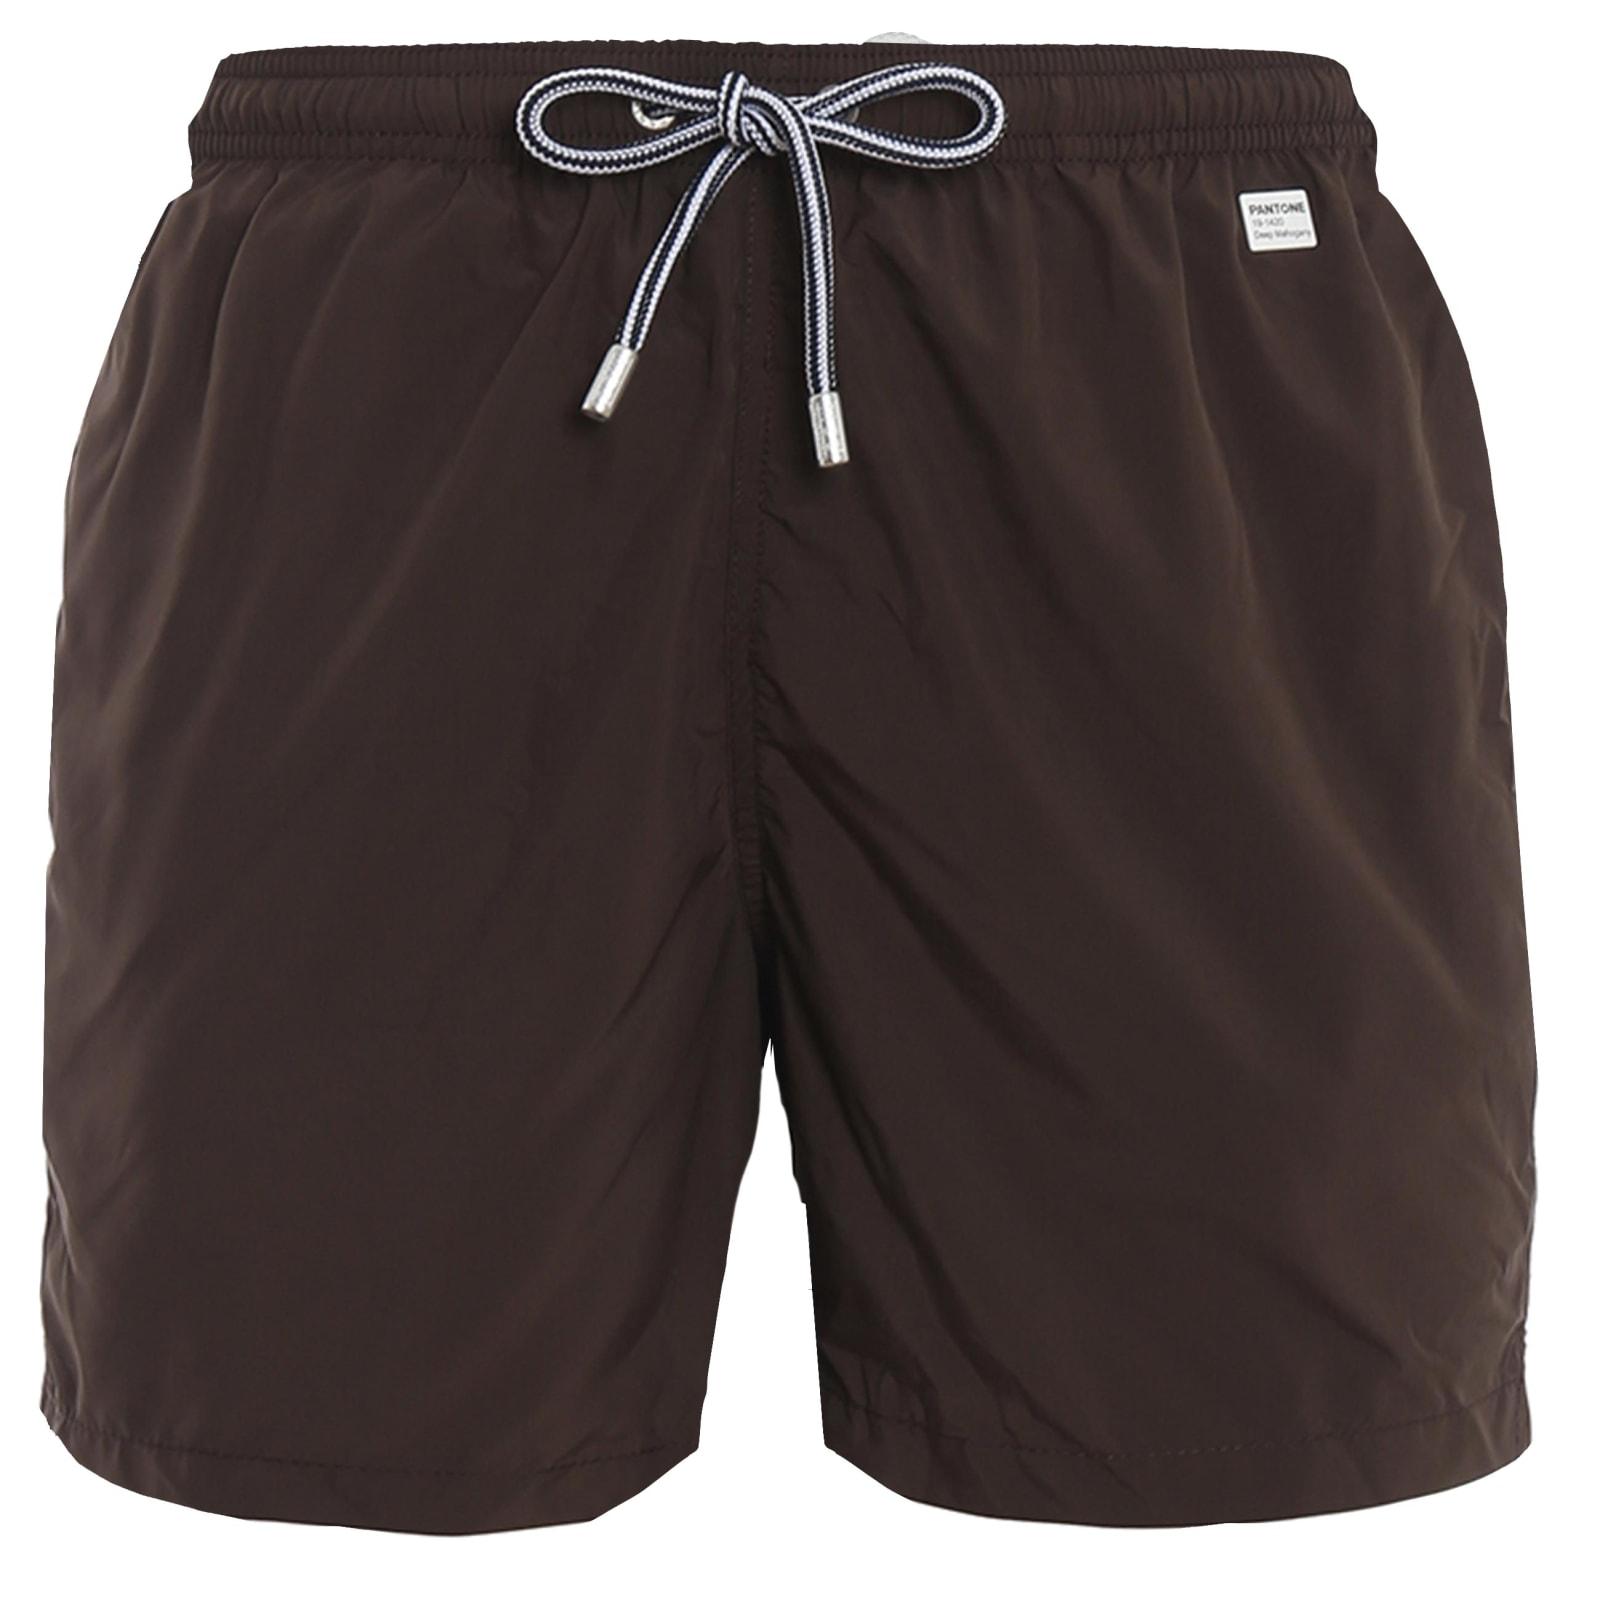 Brown Ight Fabric Swim Shorts - Pantone® Special Edition